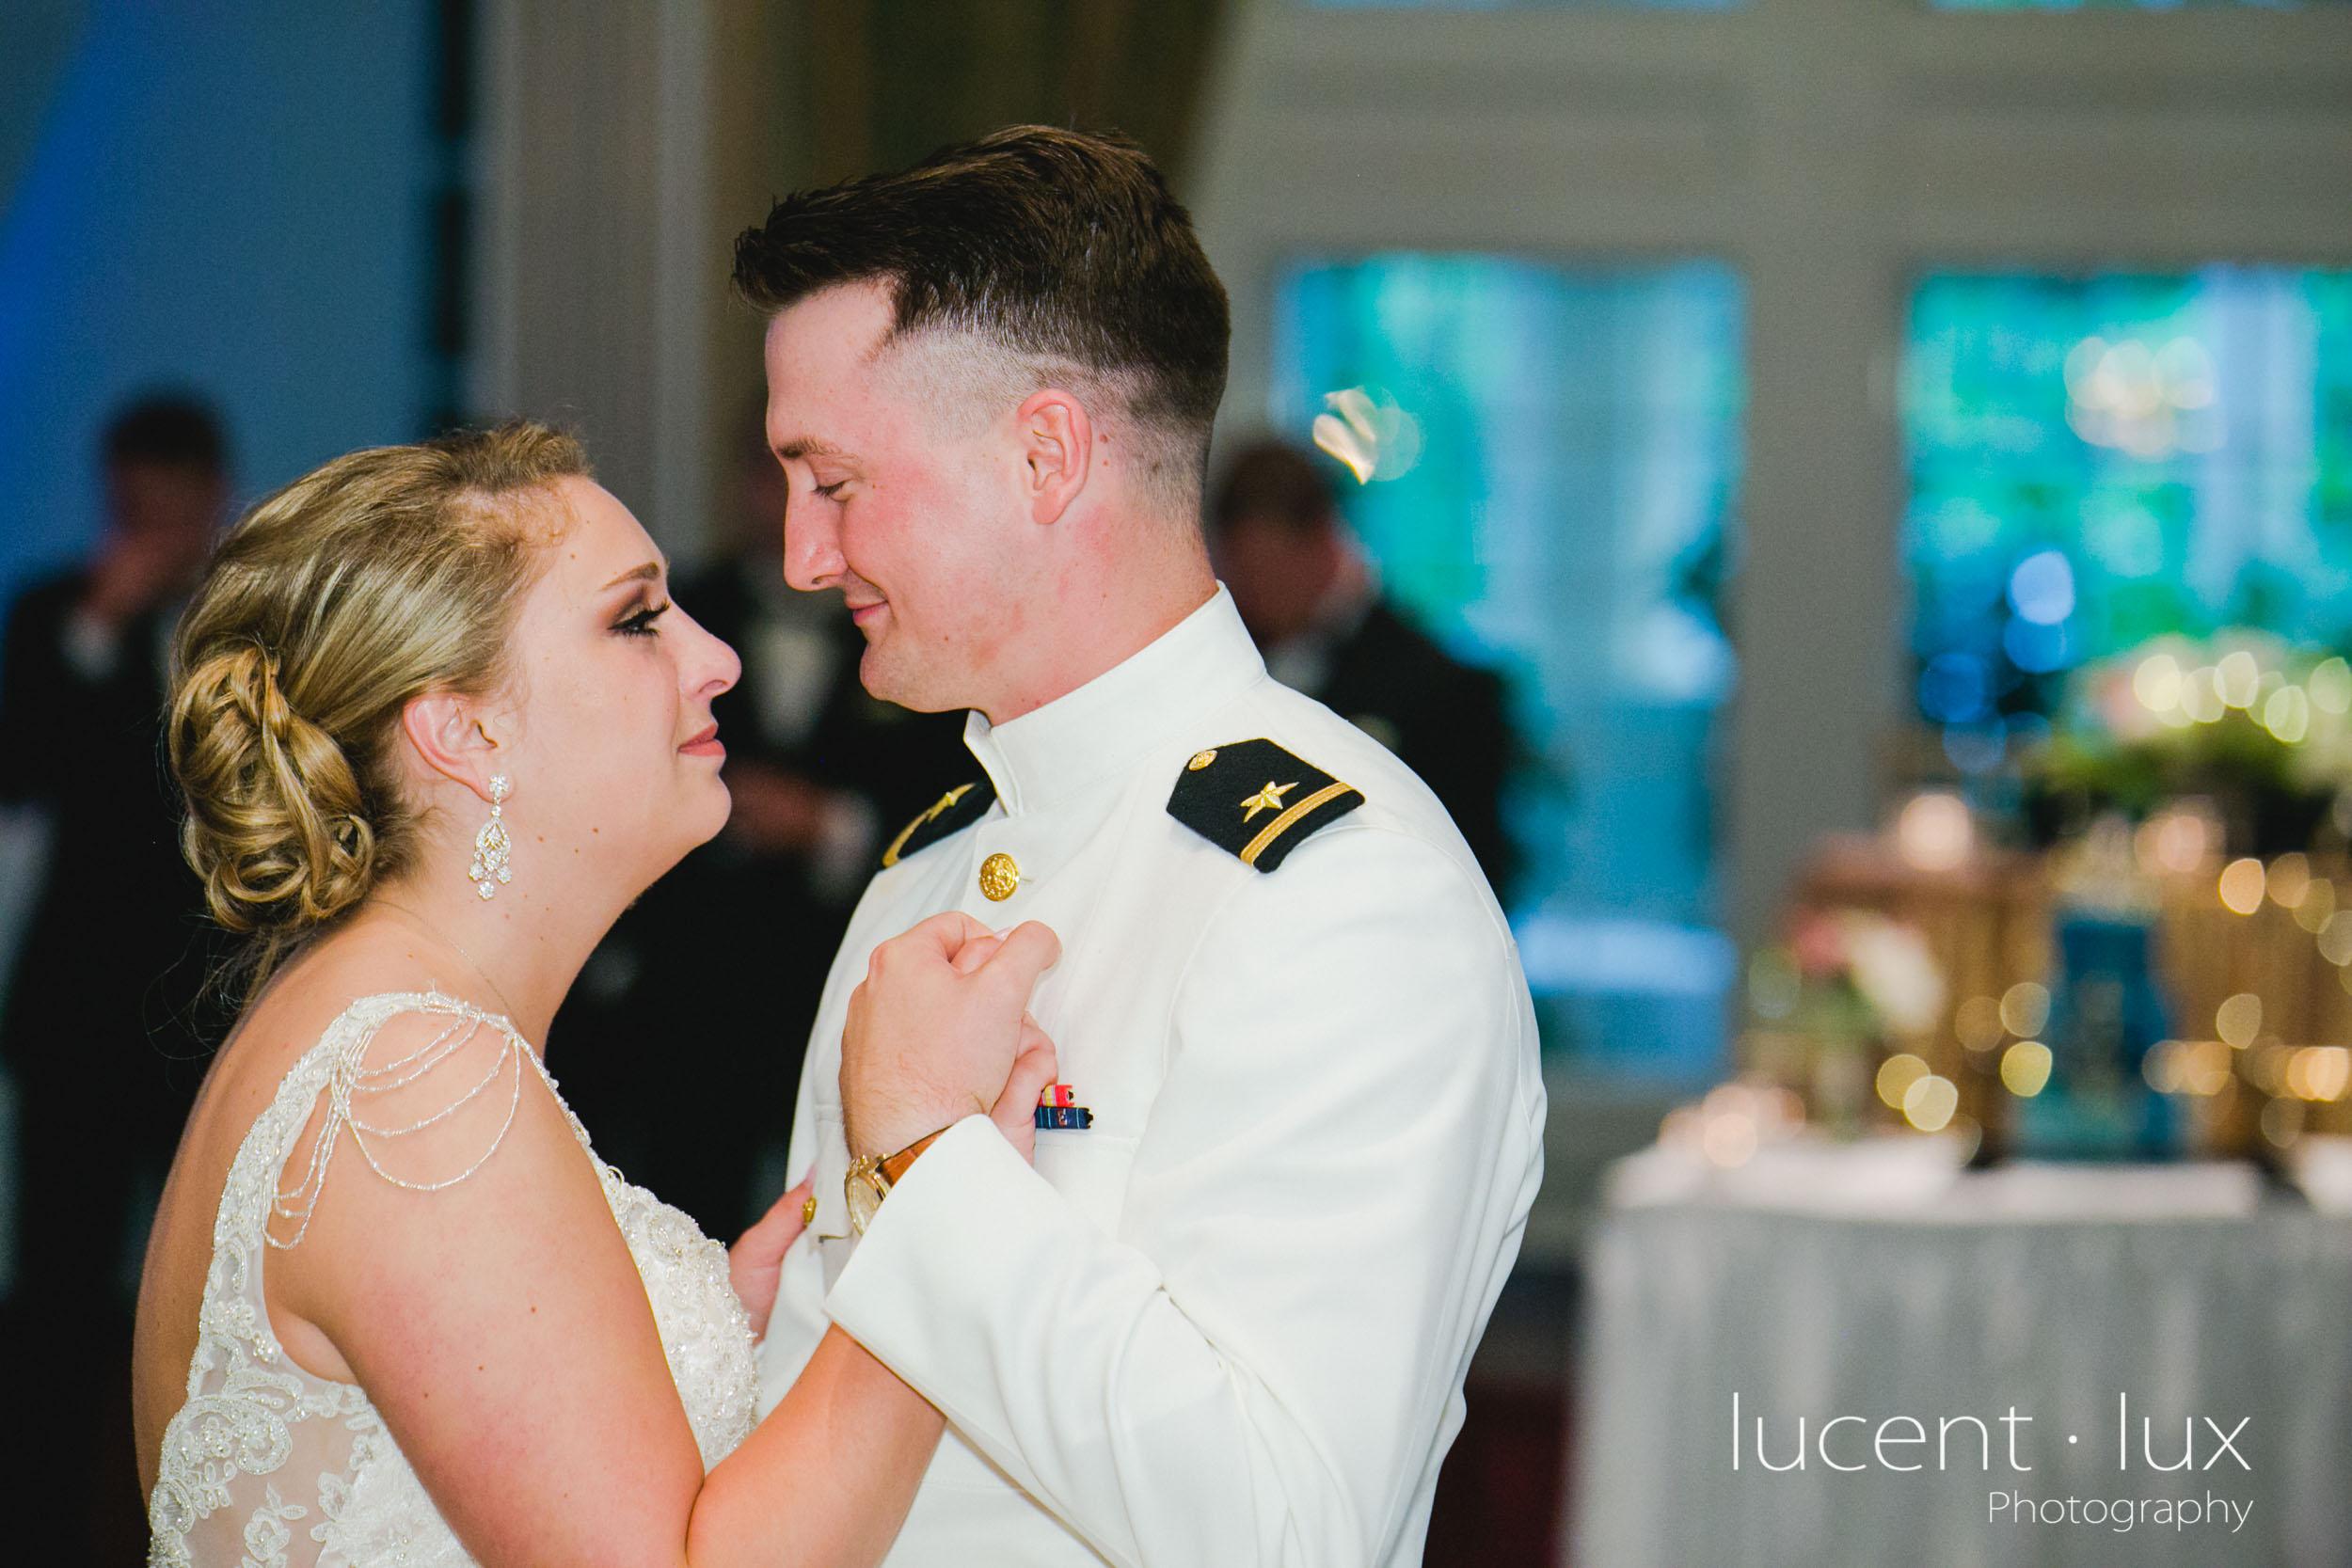 Wedding-Photography-Maryland-Pennsylvania-Photographer-Mendenhall-Inn-Media-Portrait-Event-400.jpg